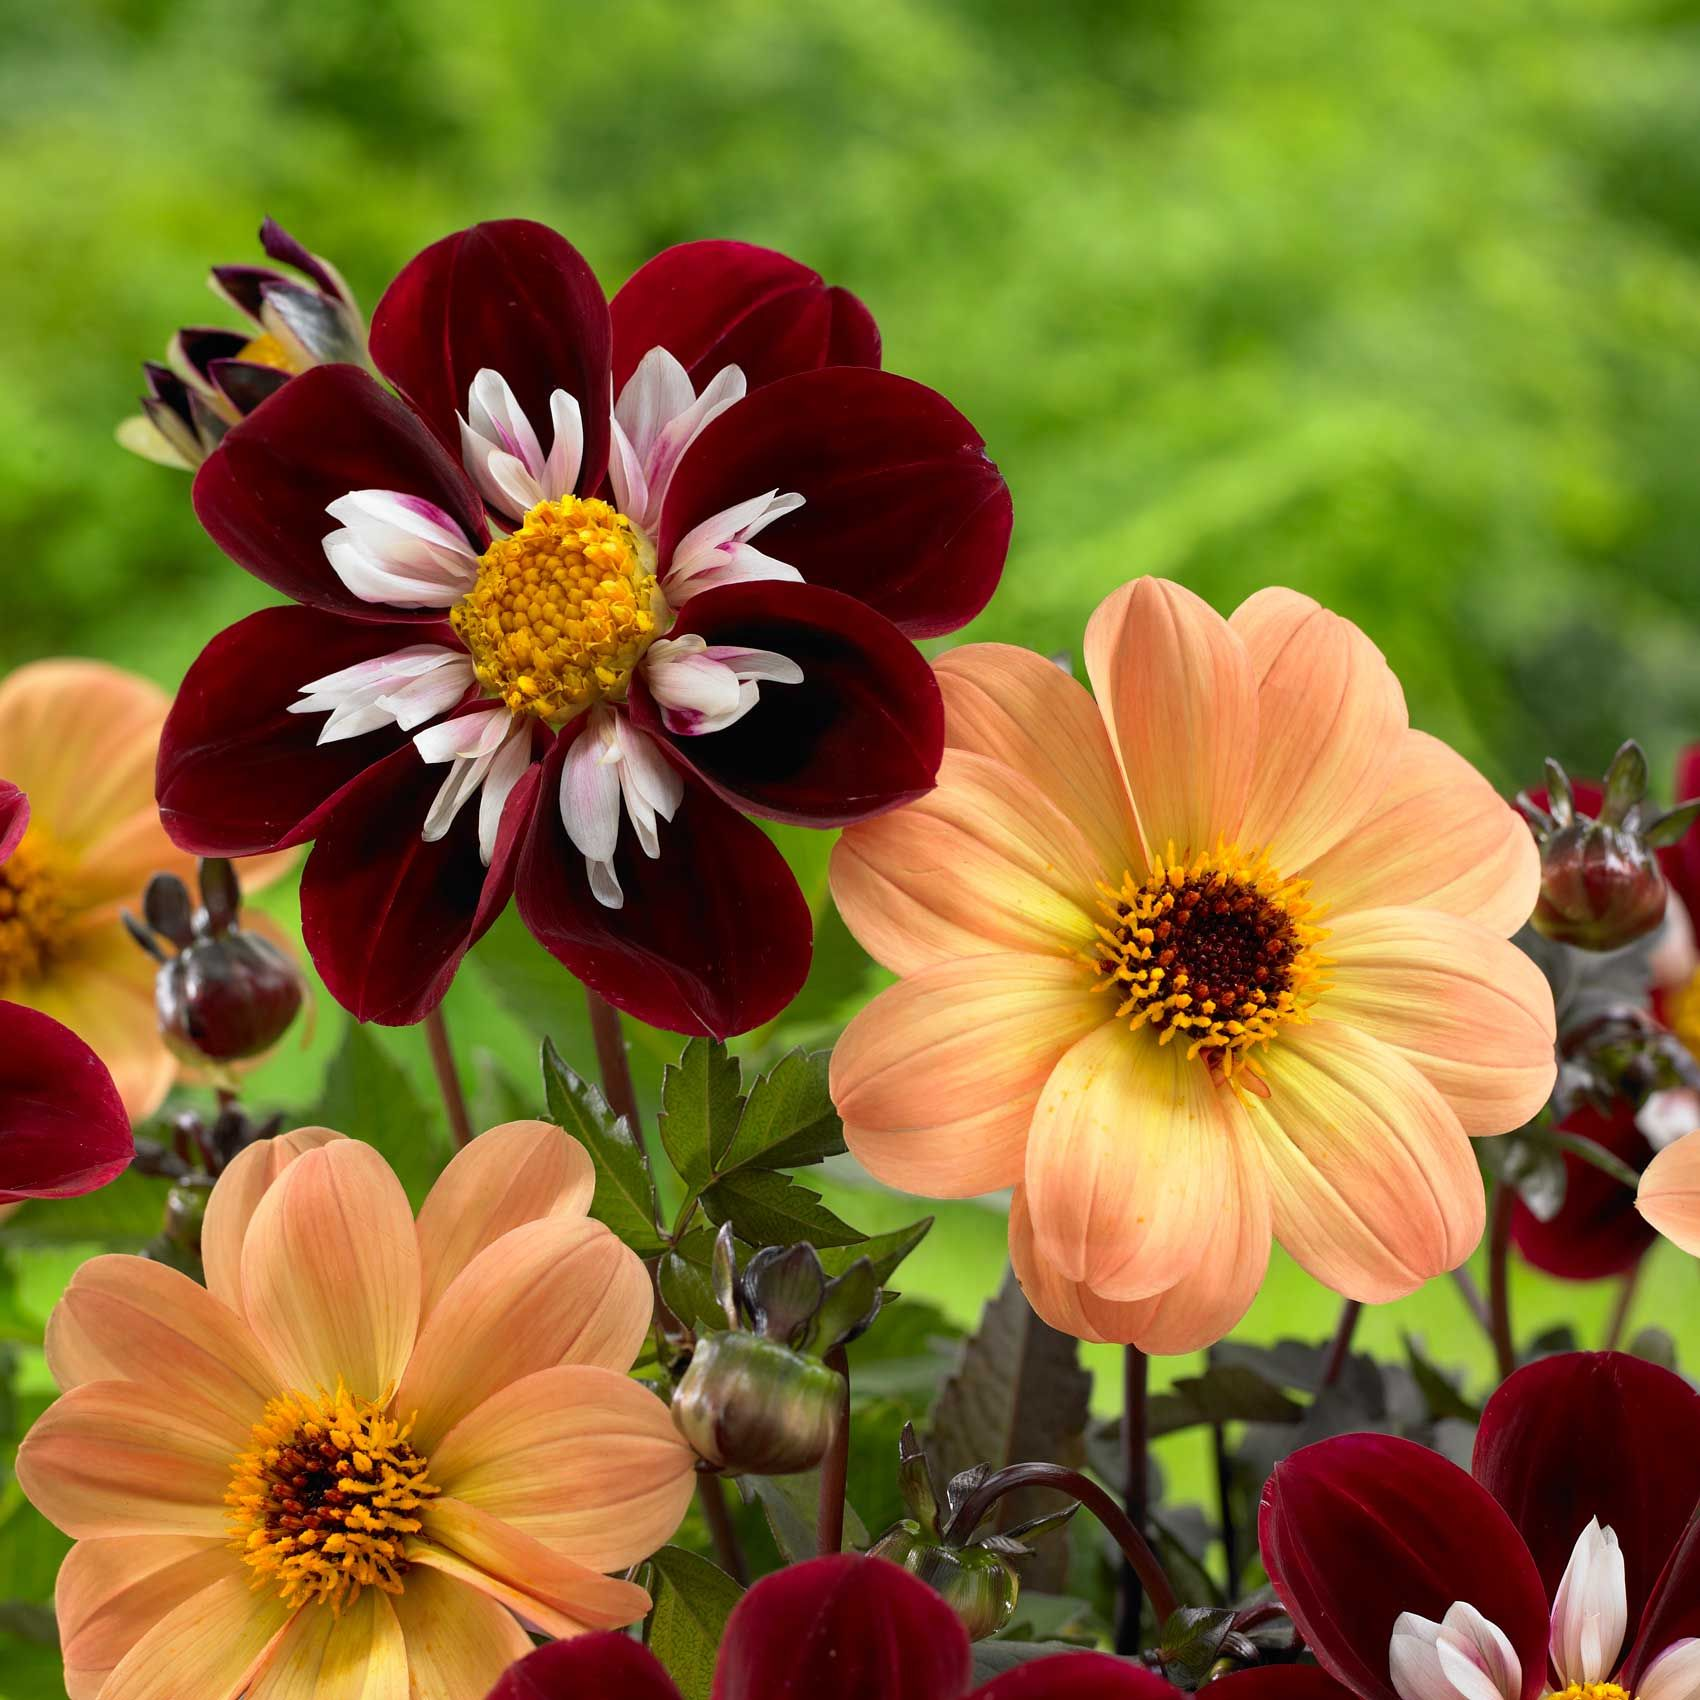 Mignon Dahlias Have Daisy Like Flowers With A Single Row Of Petals Around A Contrasting Center The Compact Plan Dahlia Flower Dahlias Garden Longfield Gardens